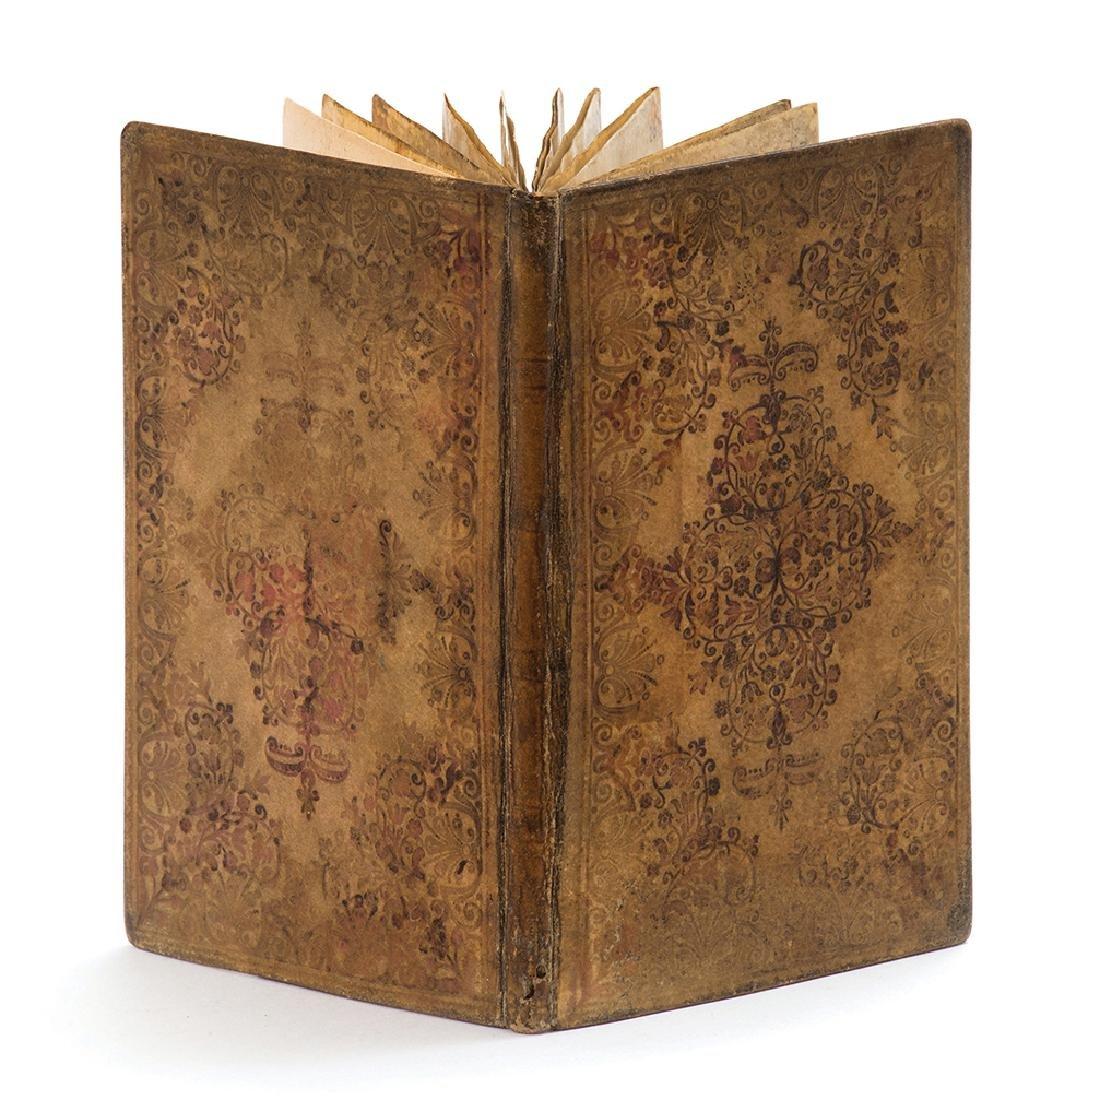 Illuminated Parchment Manuscript - Seder Birkat